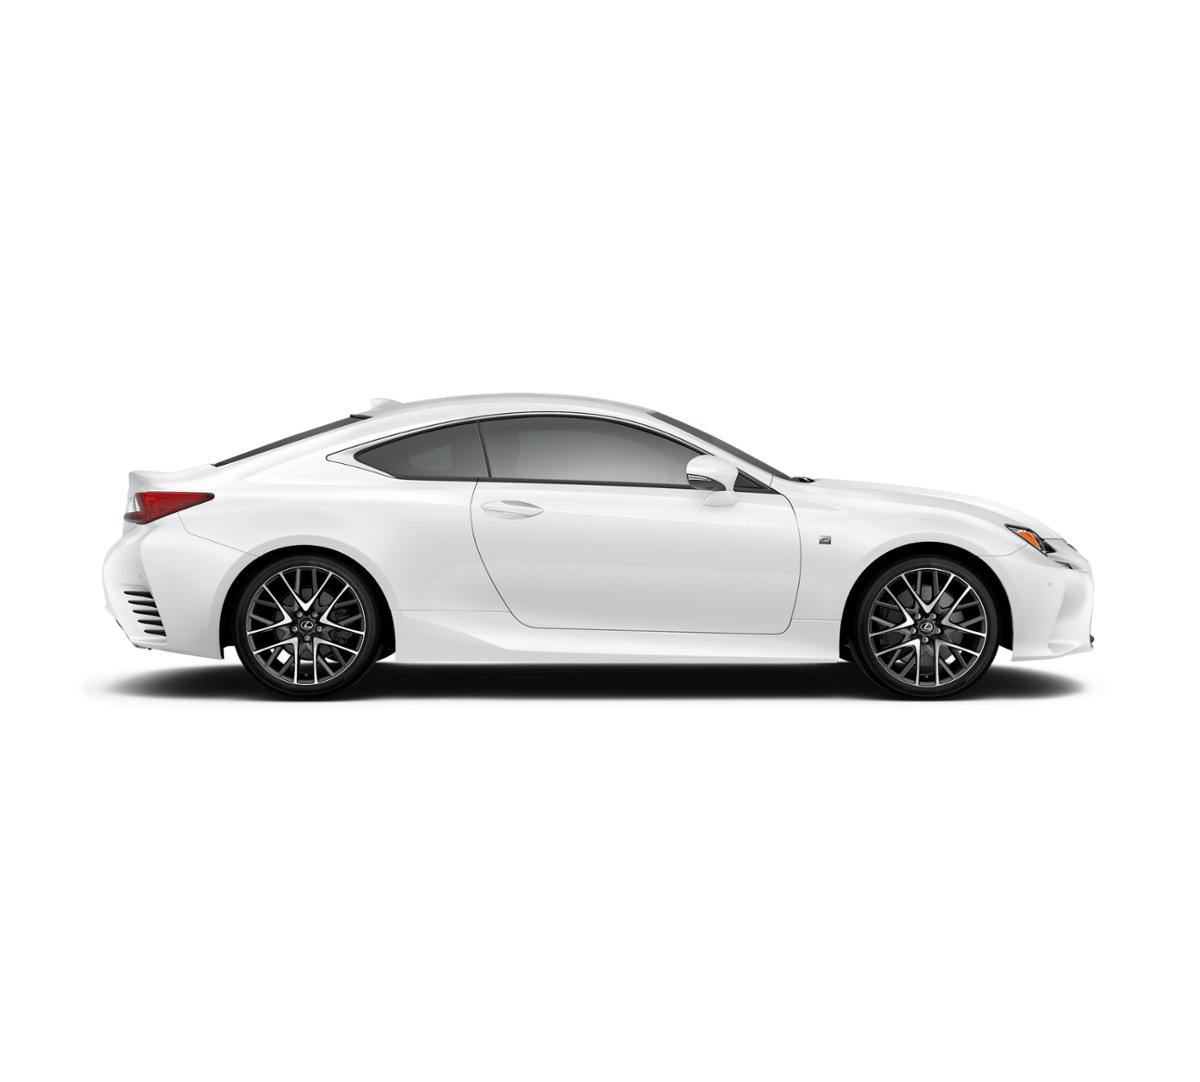 Lexus Rc 350 F Sport Price: New Ultra White 2018 Lexus RC 350 F Sport In Tampa, FL